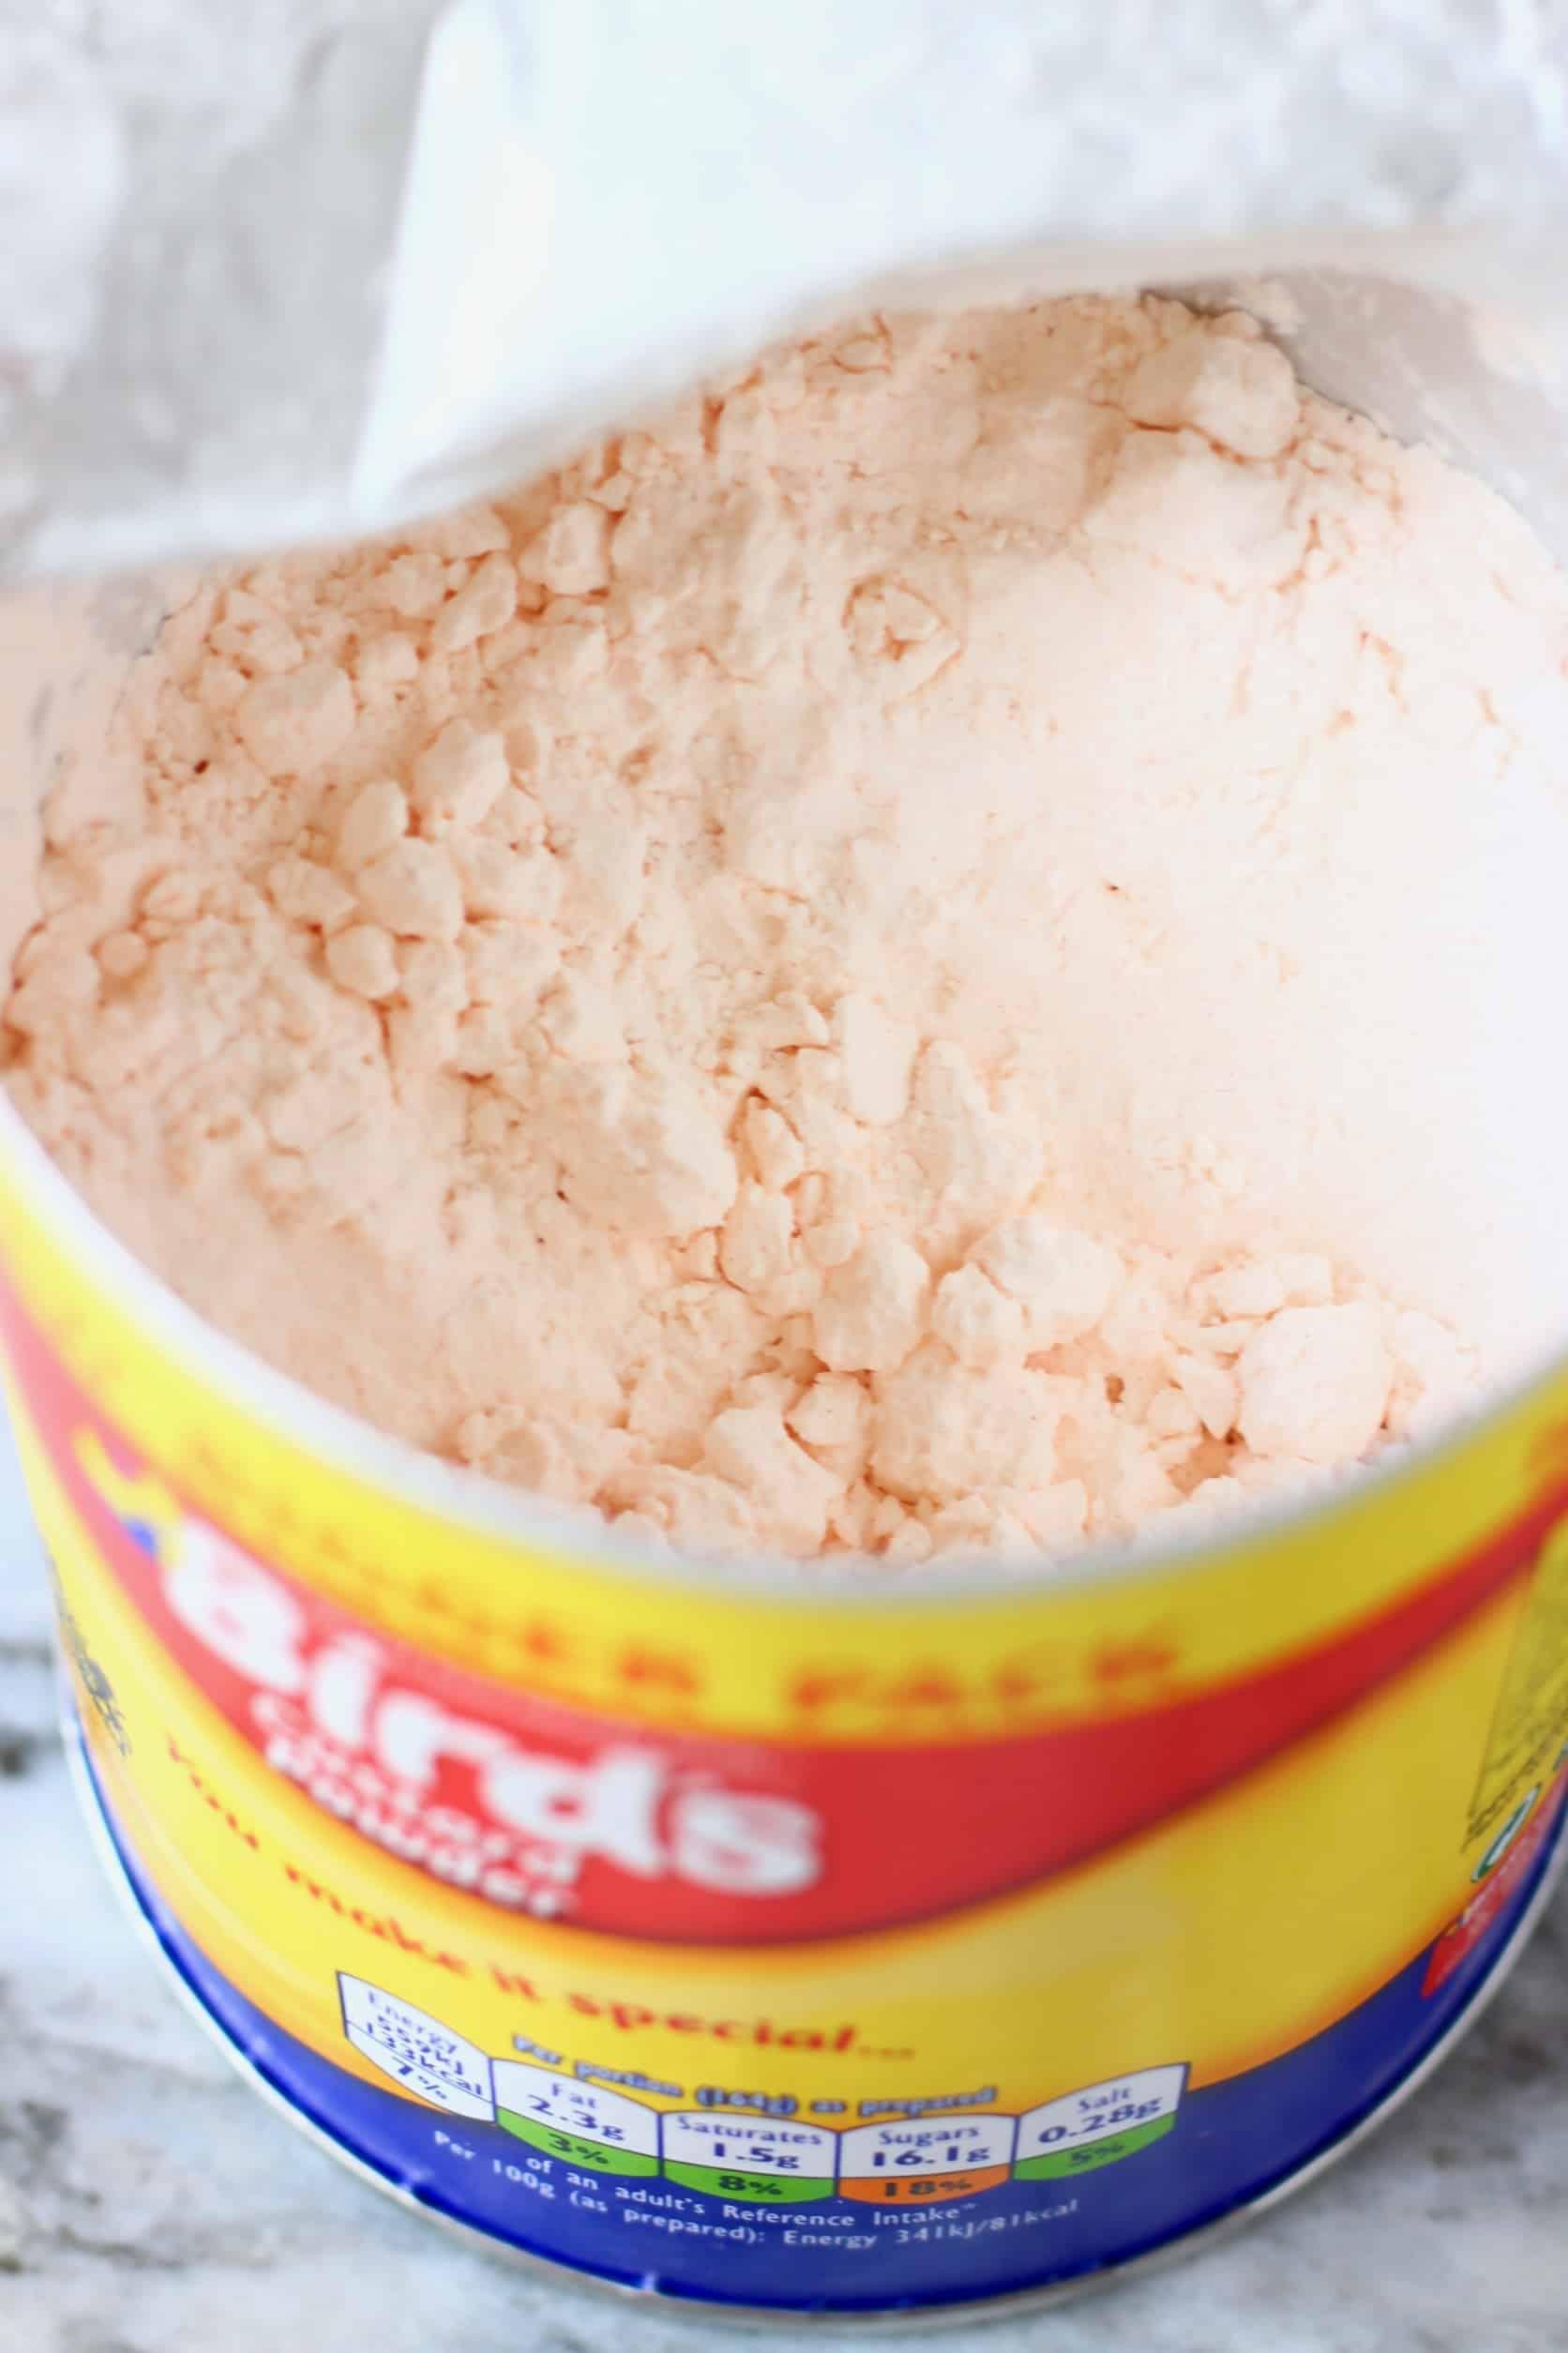 A tin of Bird's custard powder with the lid open